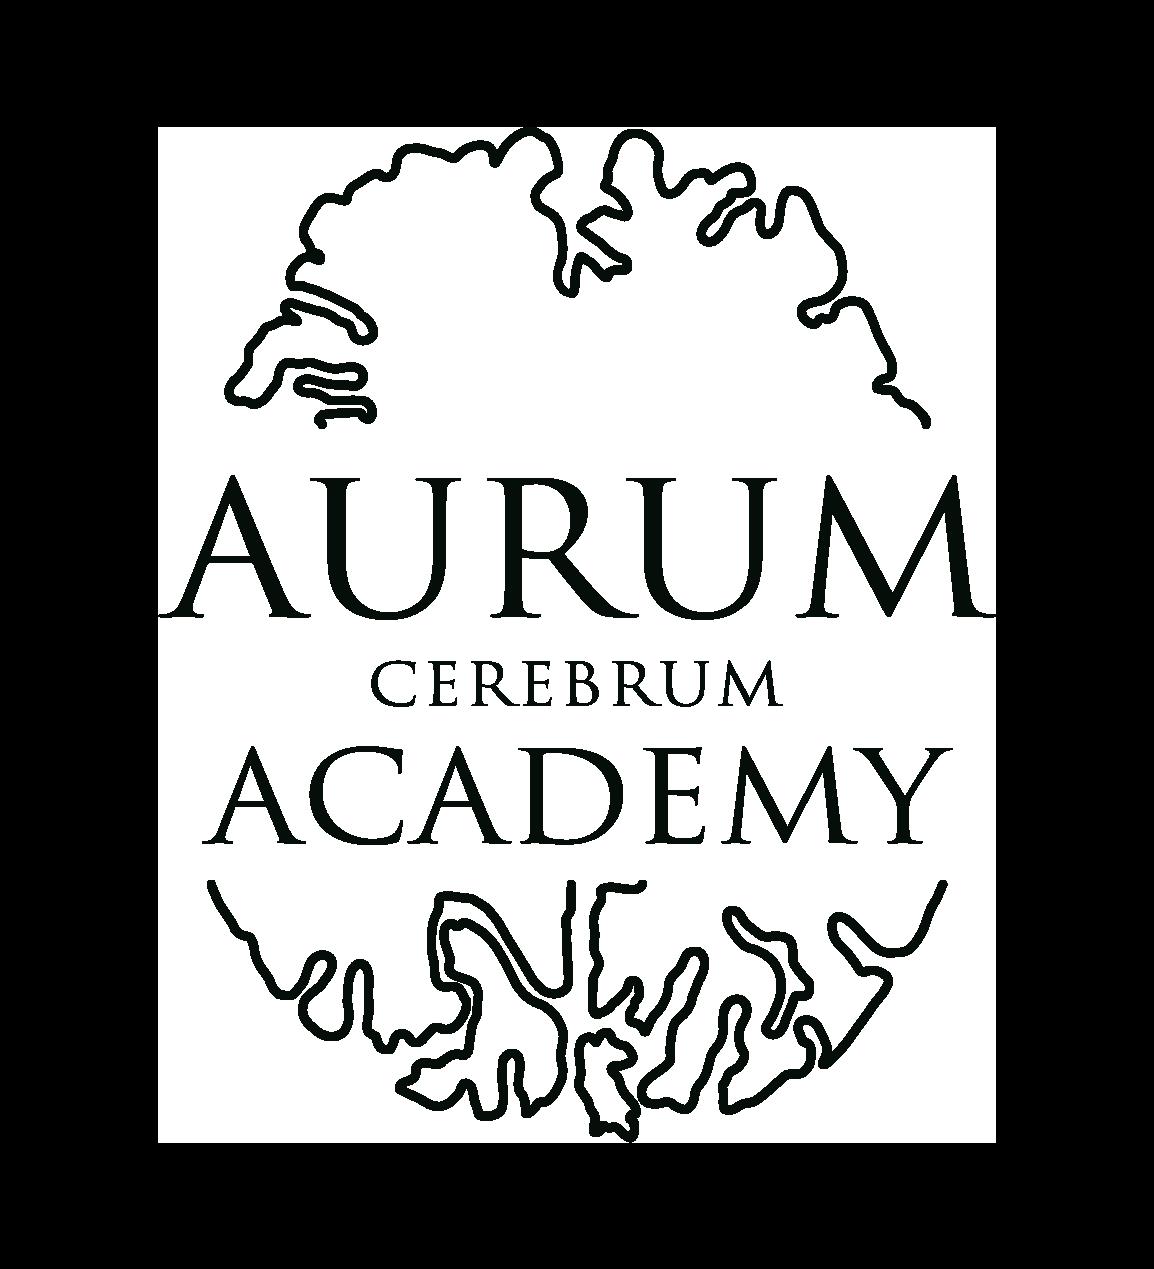 Академия АУРУМ